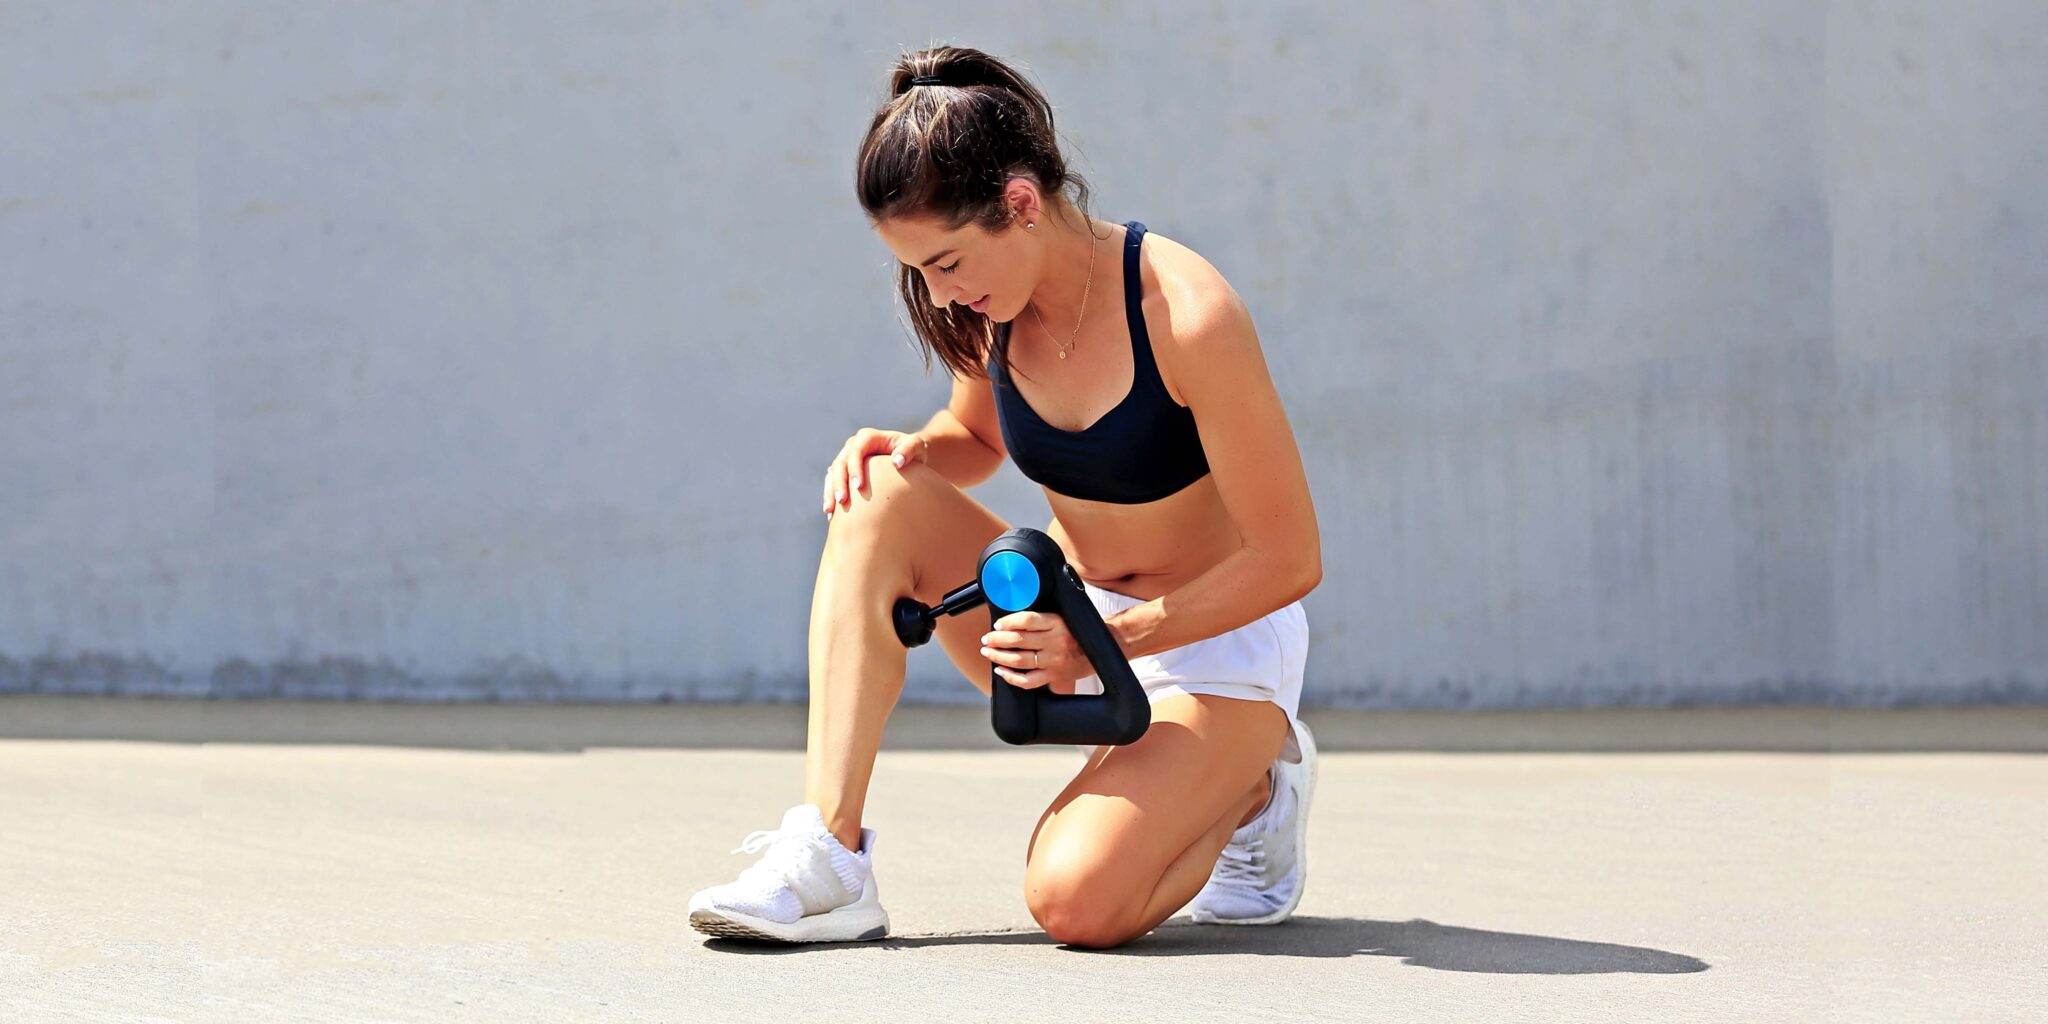 Feeling stir crazy? A run could help.